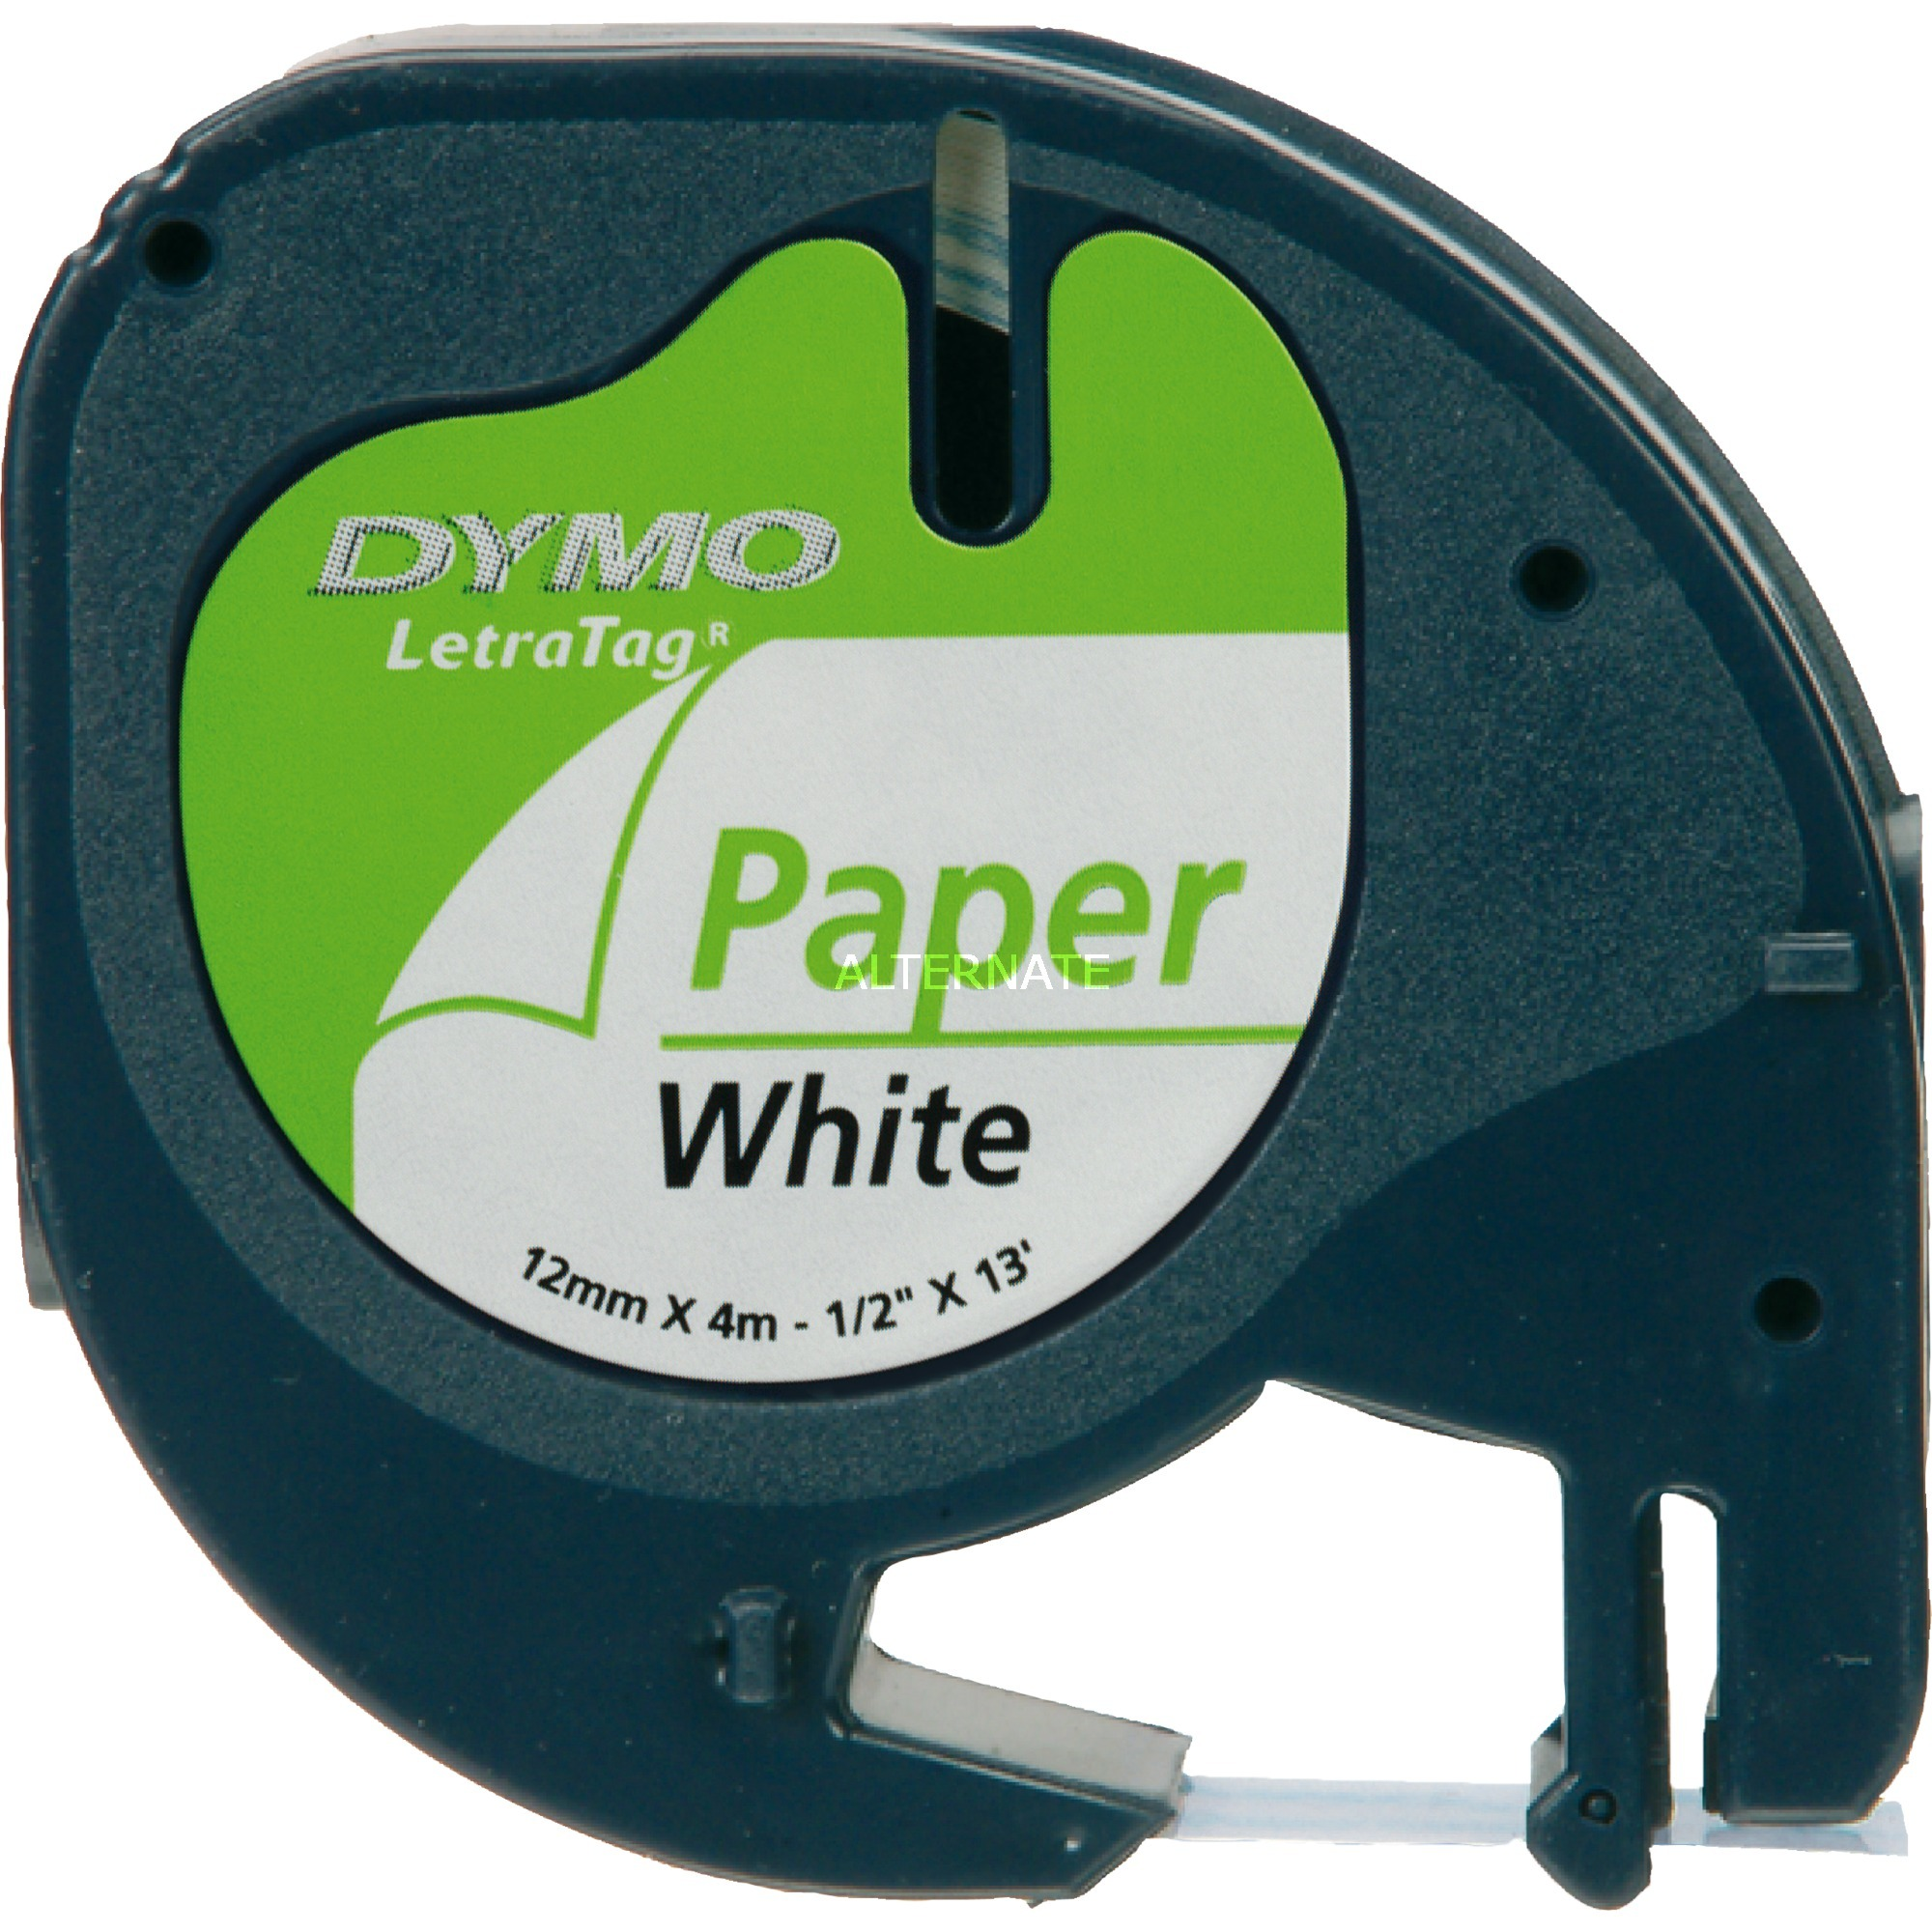 12mm LetraTAG Paper tape cinta para impresora de etiquetas, Cinta de escritura